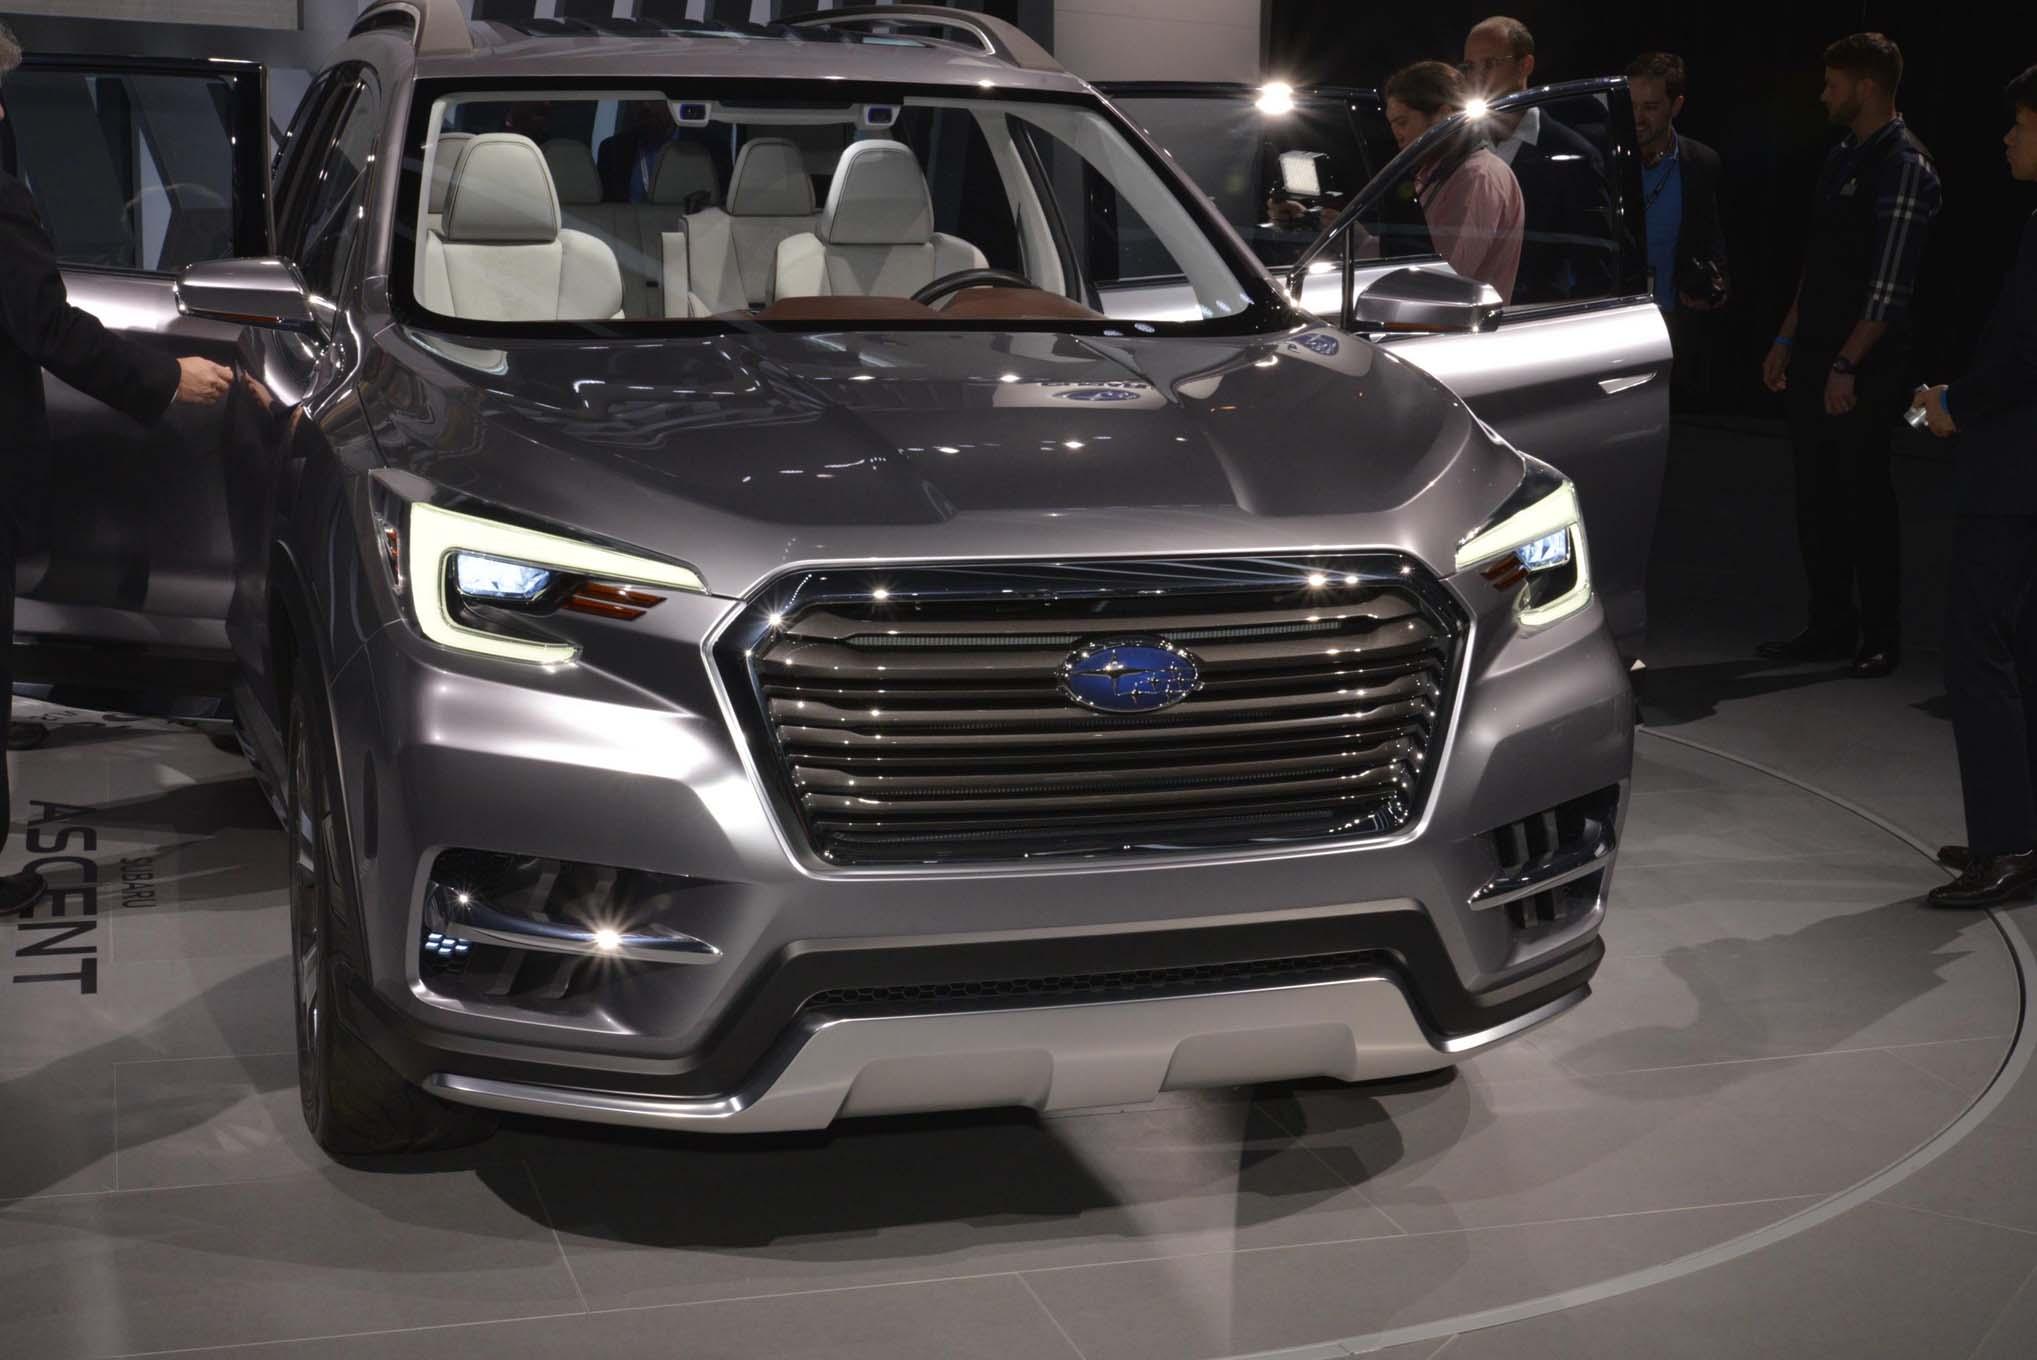 2019 Subaru Ascent front end - Motor Trend en Español